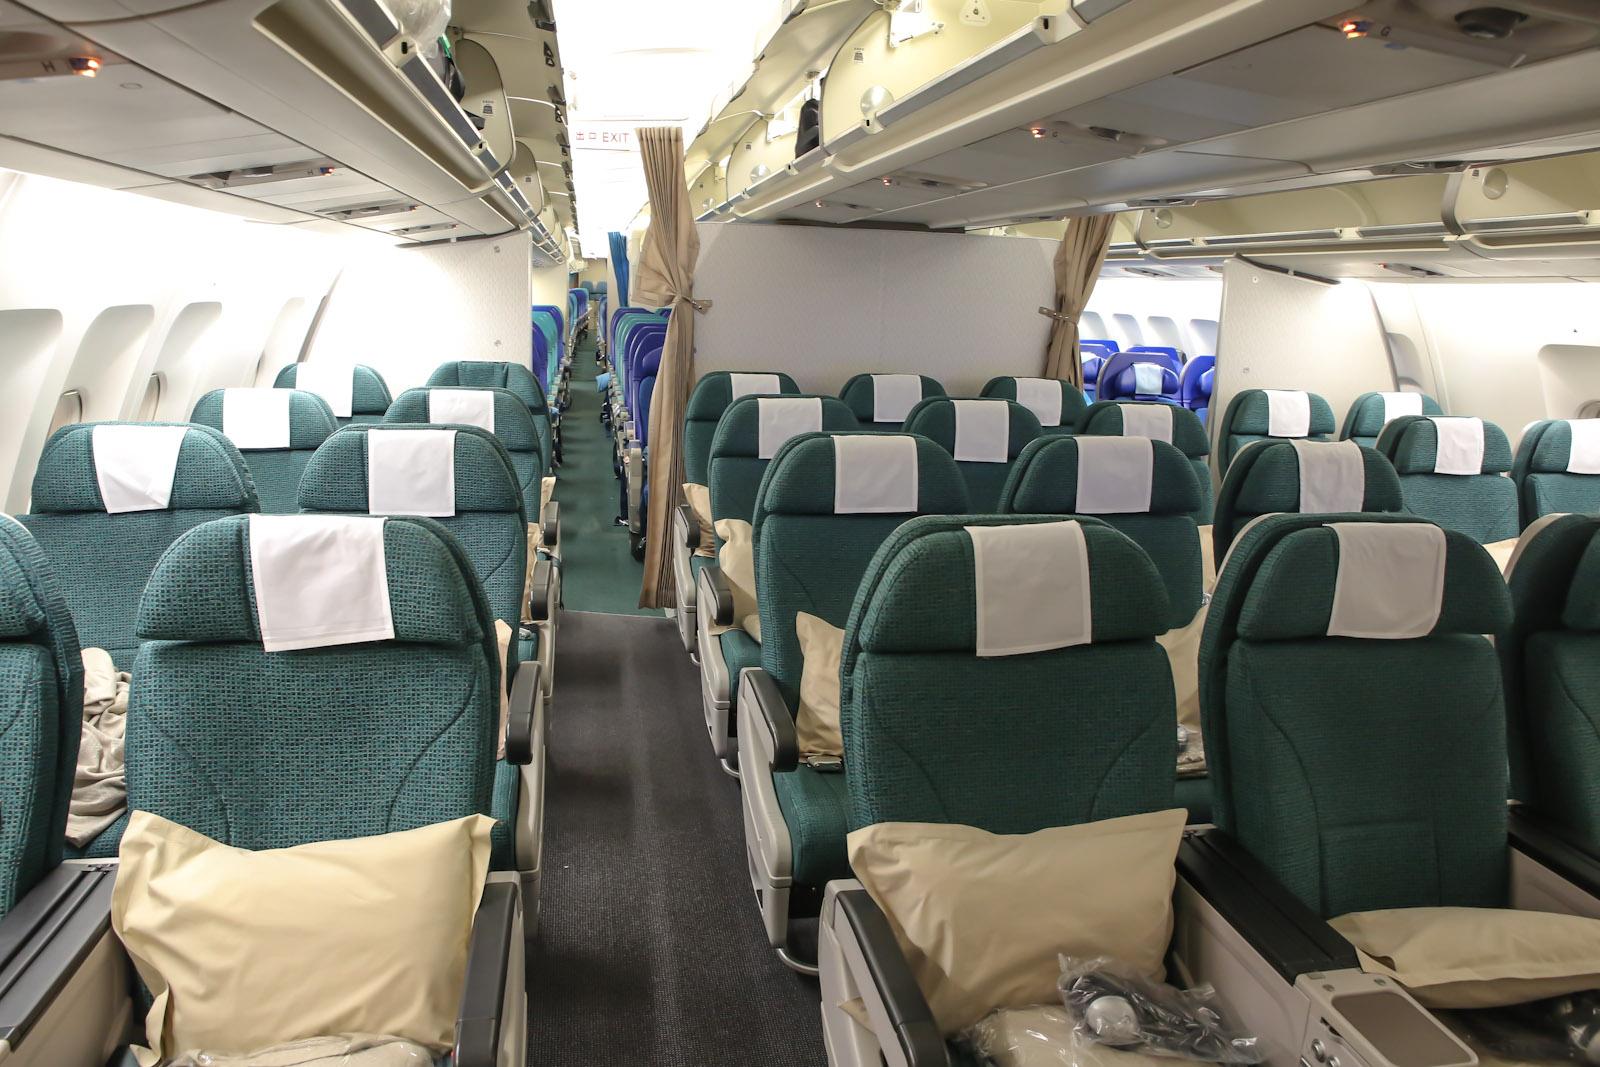 Салон премиального эконом-класса самолета Airbus A340-300 авиакомпании Cathay Pacific